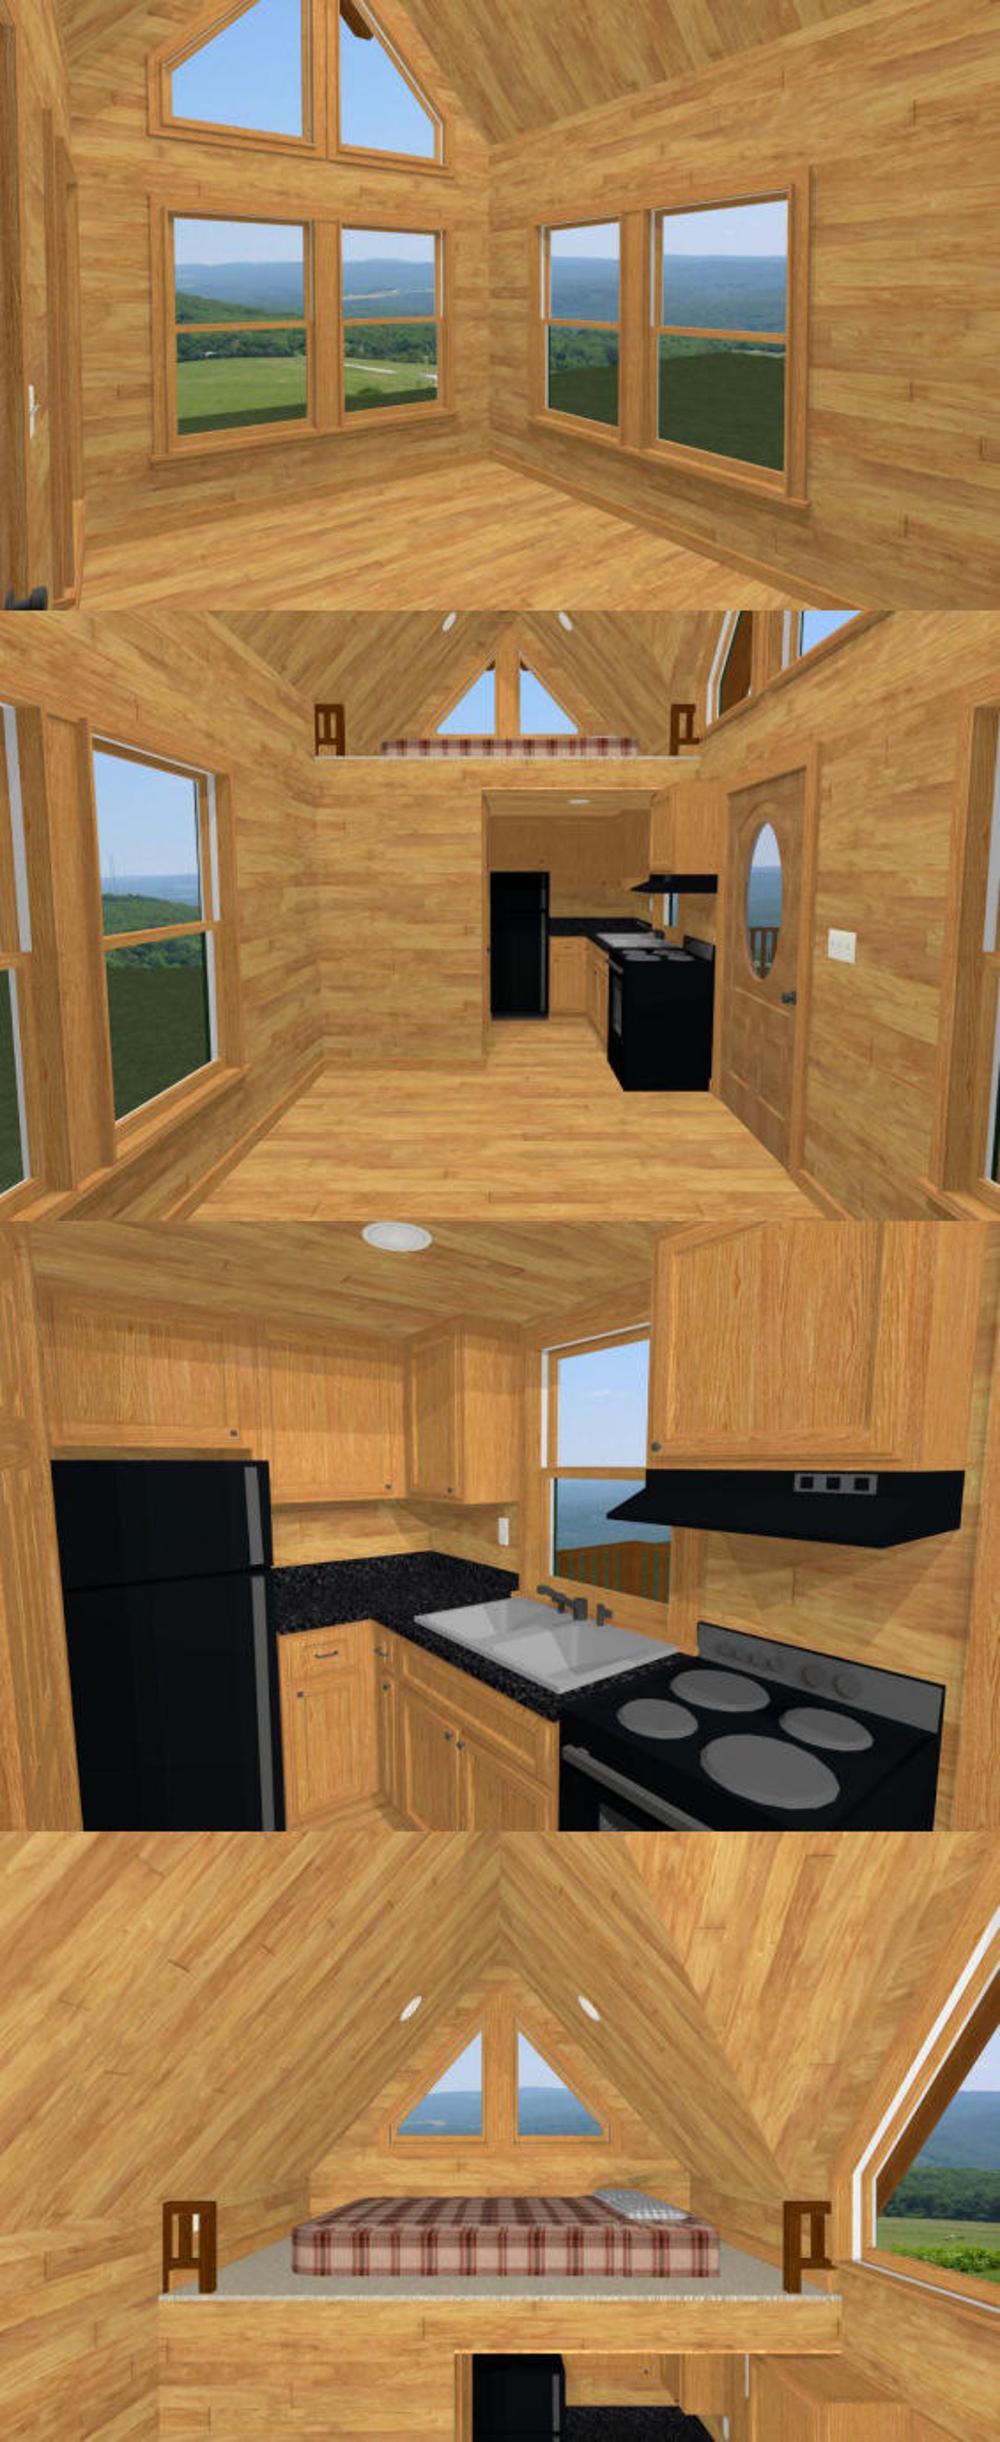 20x10 Tiny House 1Bedroom 1Bath 266 sq ft PDF